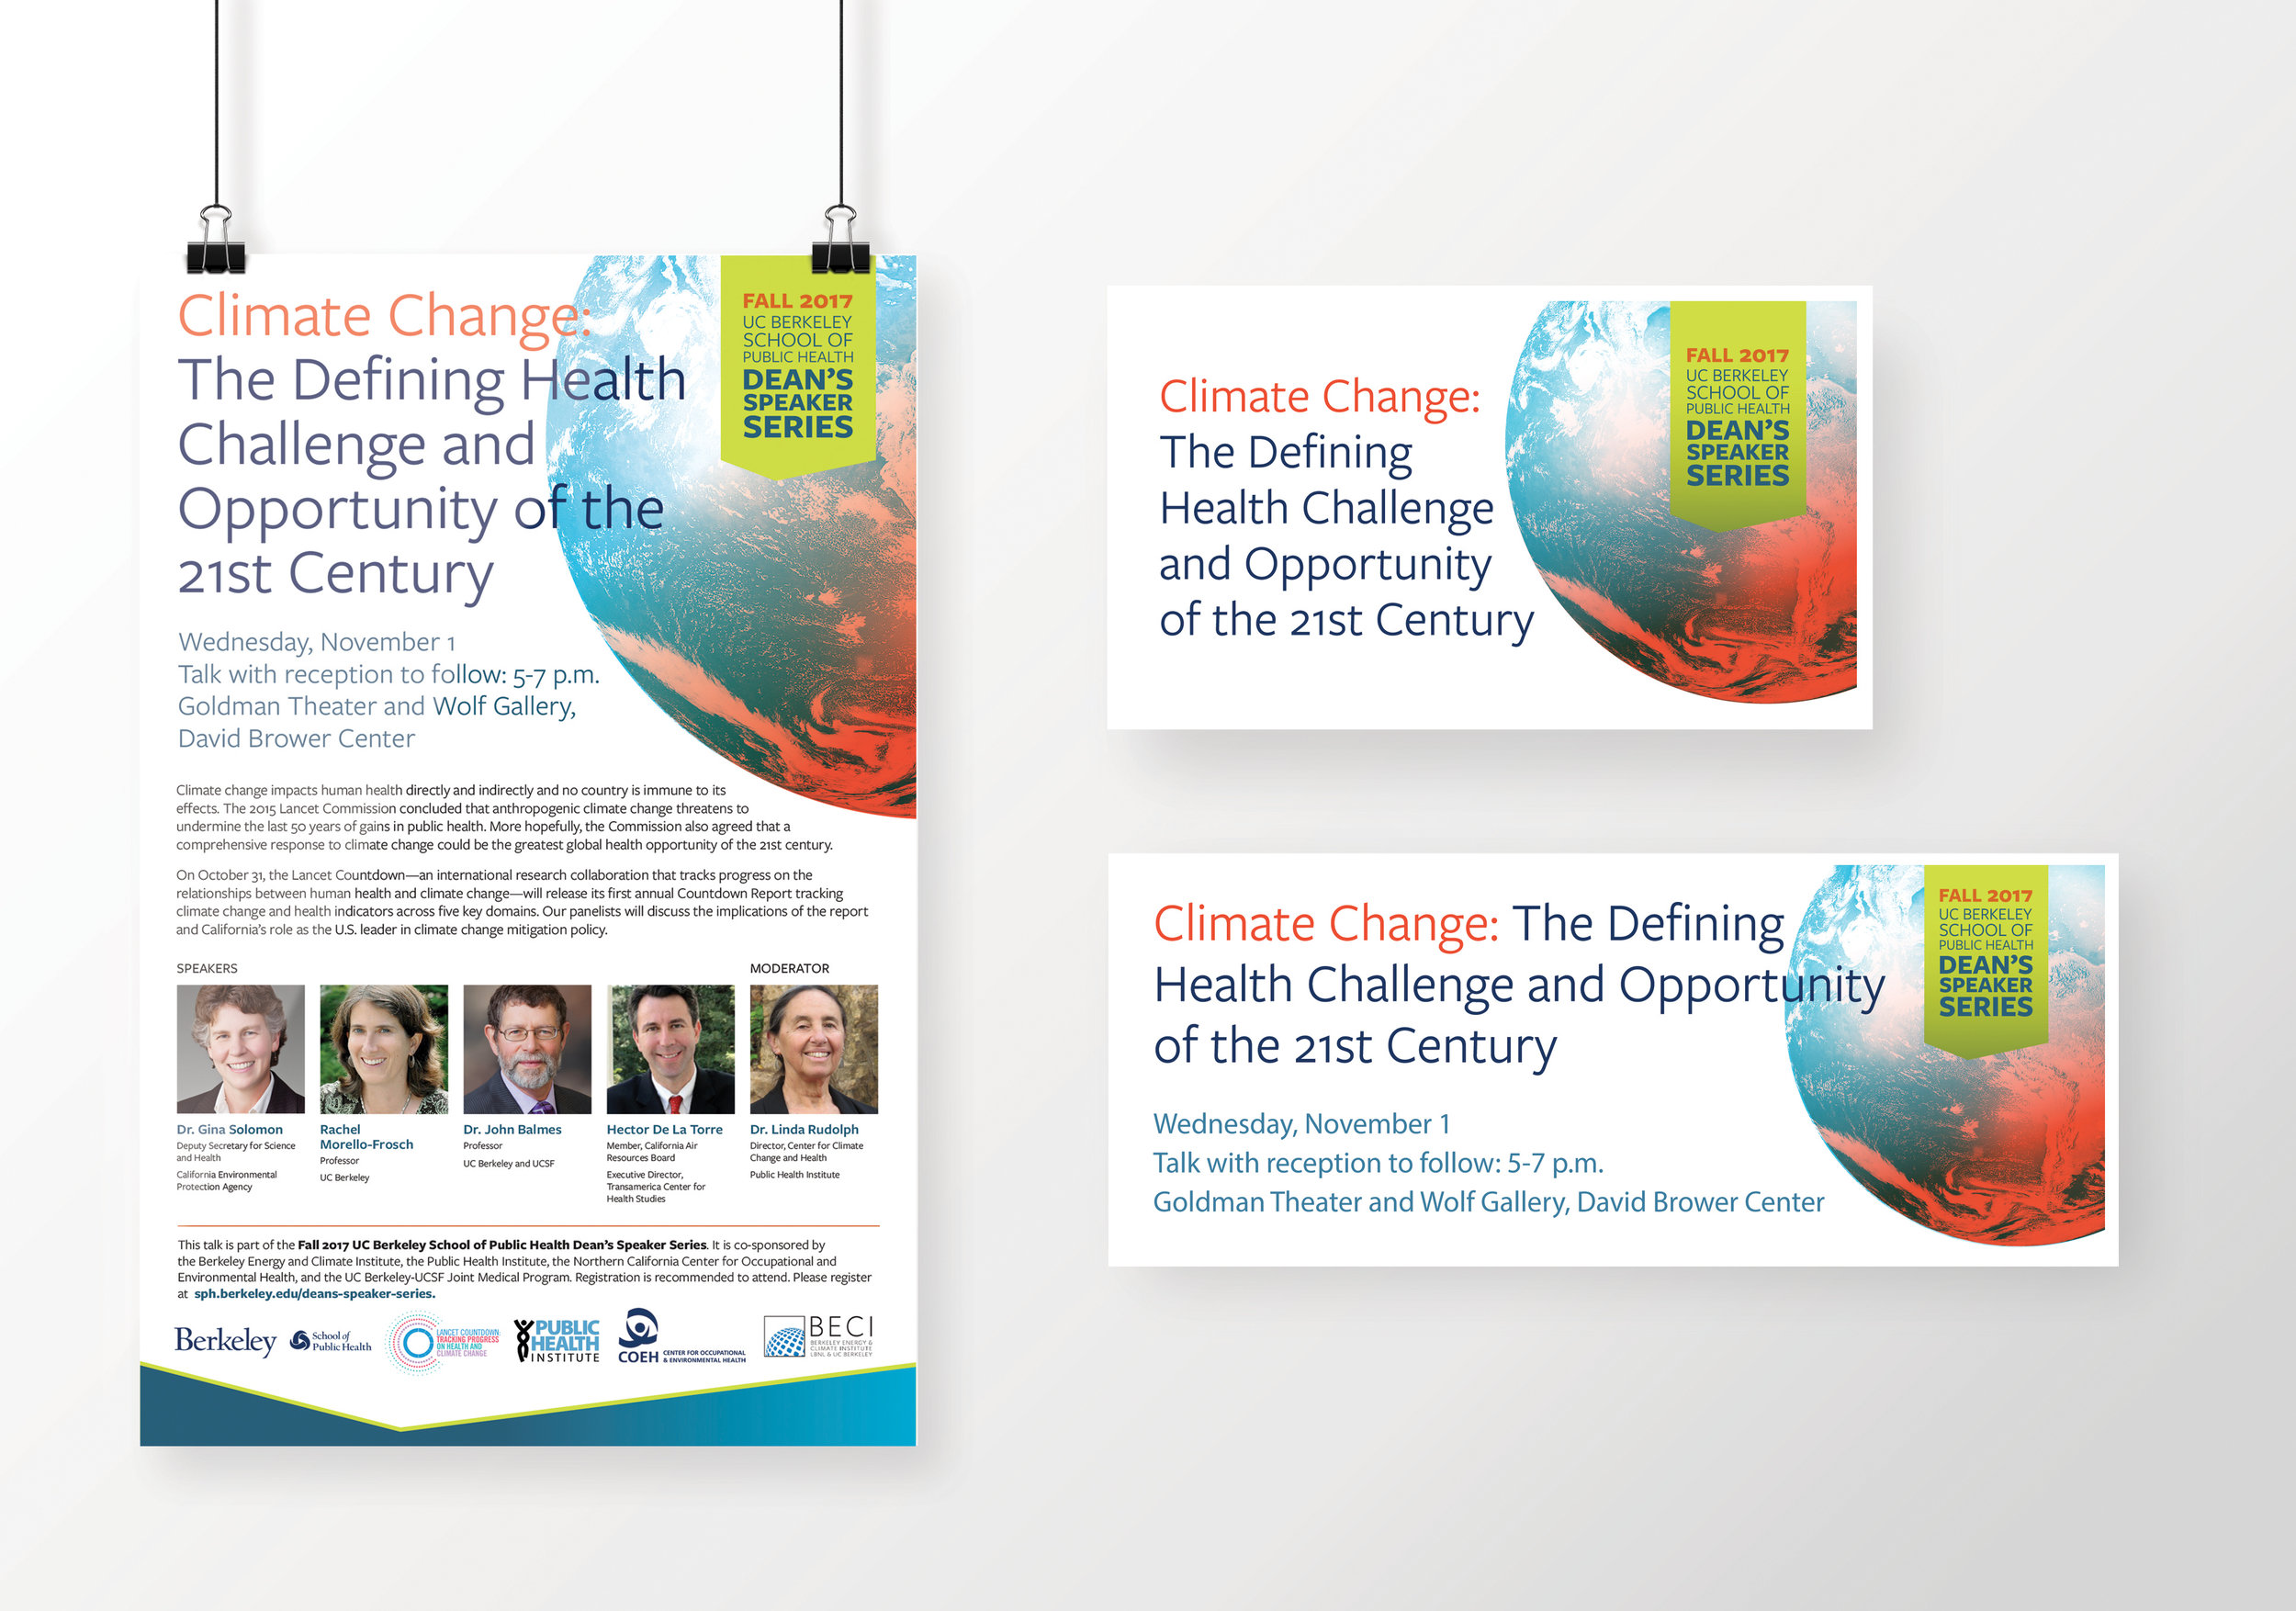 UC Berkeley School of Public Health Dean Speaker Series: Climate Change